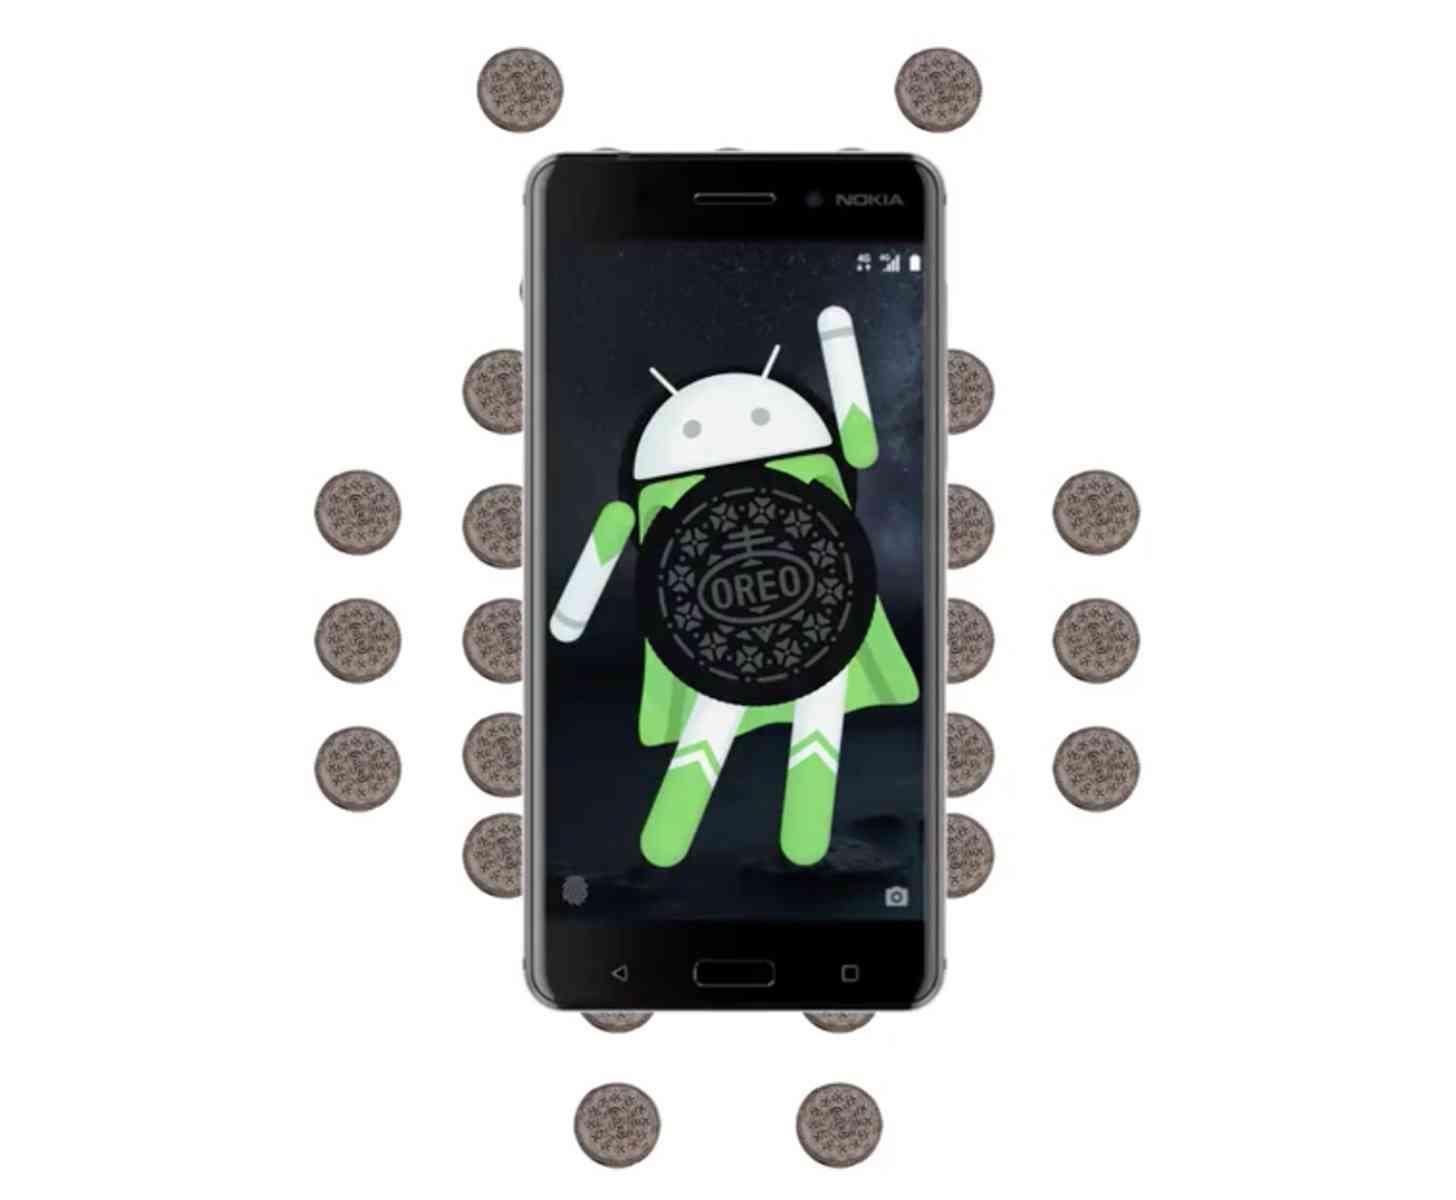 Nokia 6 gets Android 8.0 Oreo beta update | PhoneDog